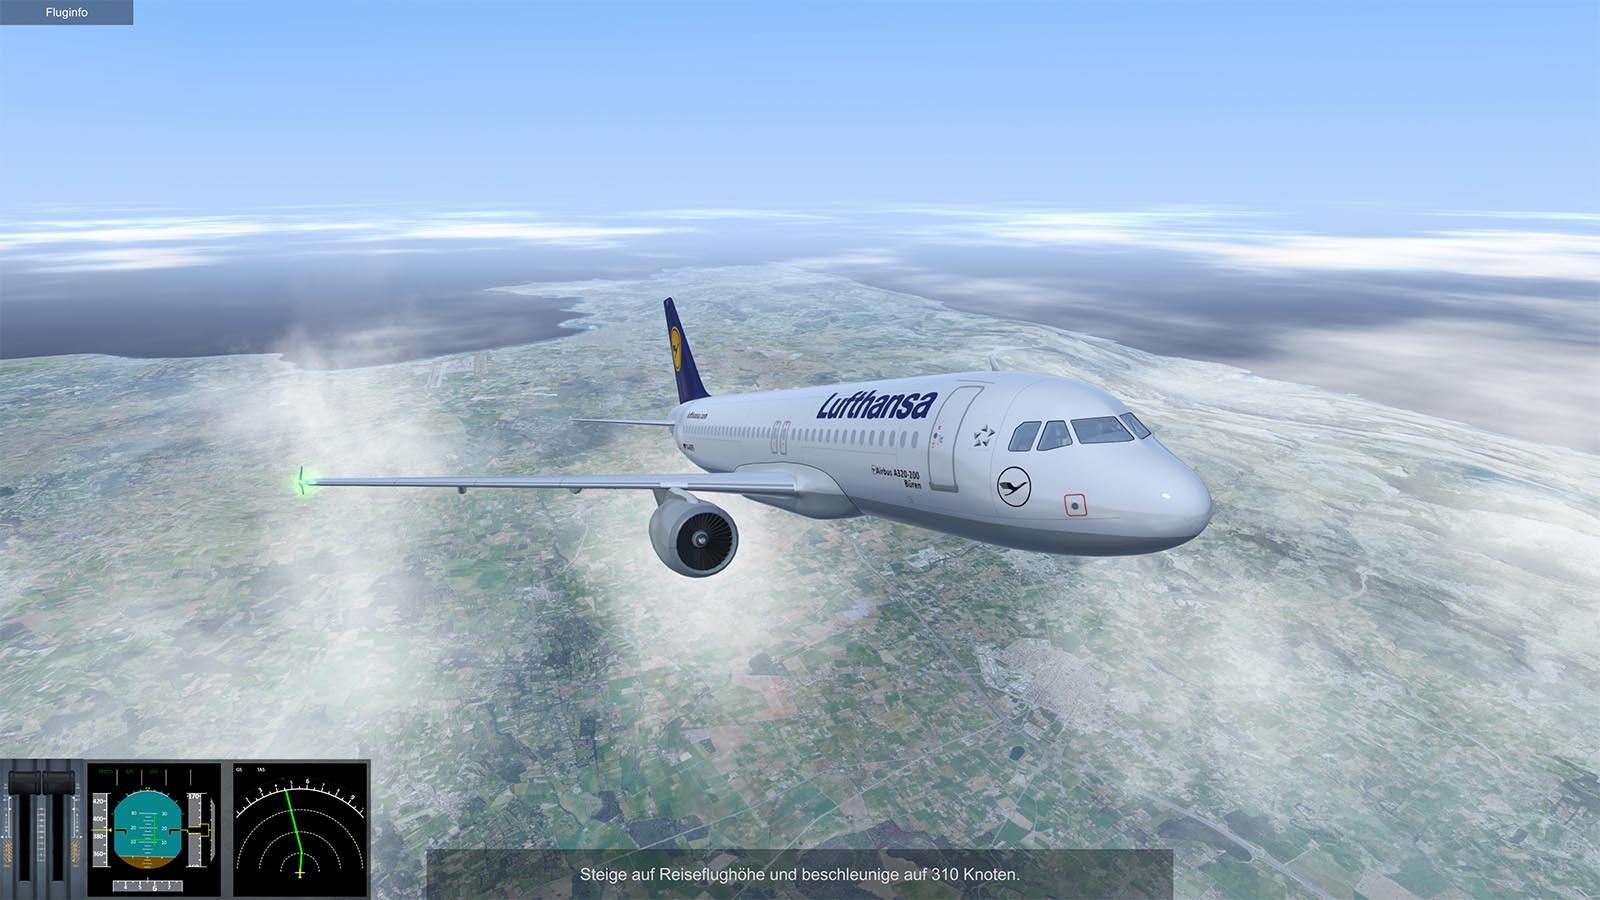 Urlaubsflug Simulator - Holiday Flight Simulator [Steam CD Key] für PC  online kaufen